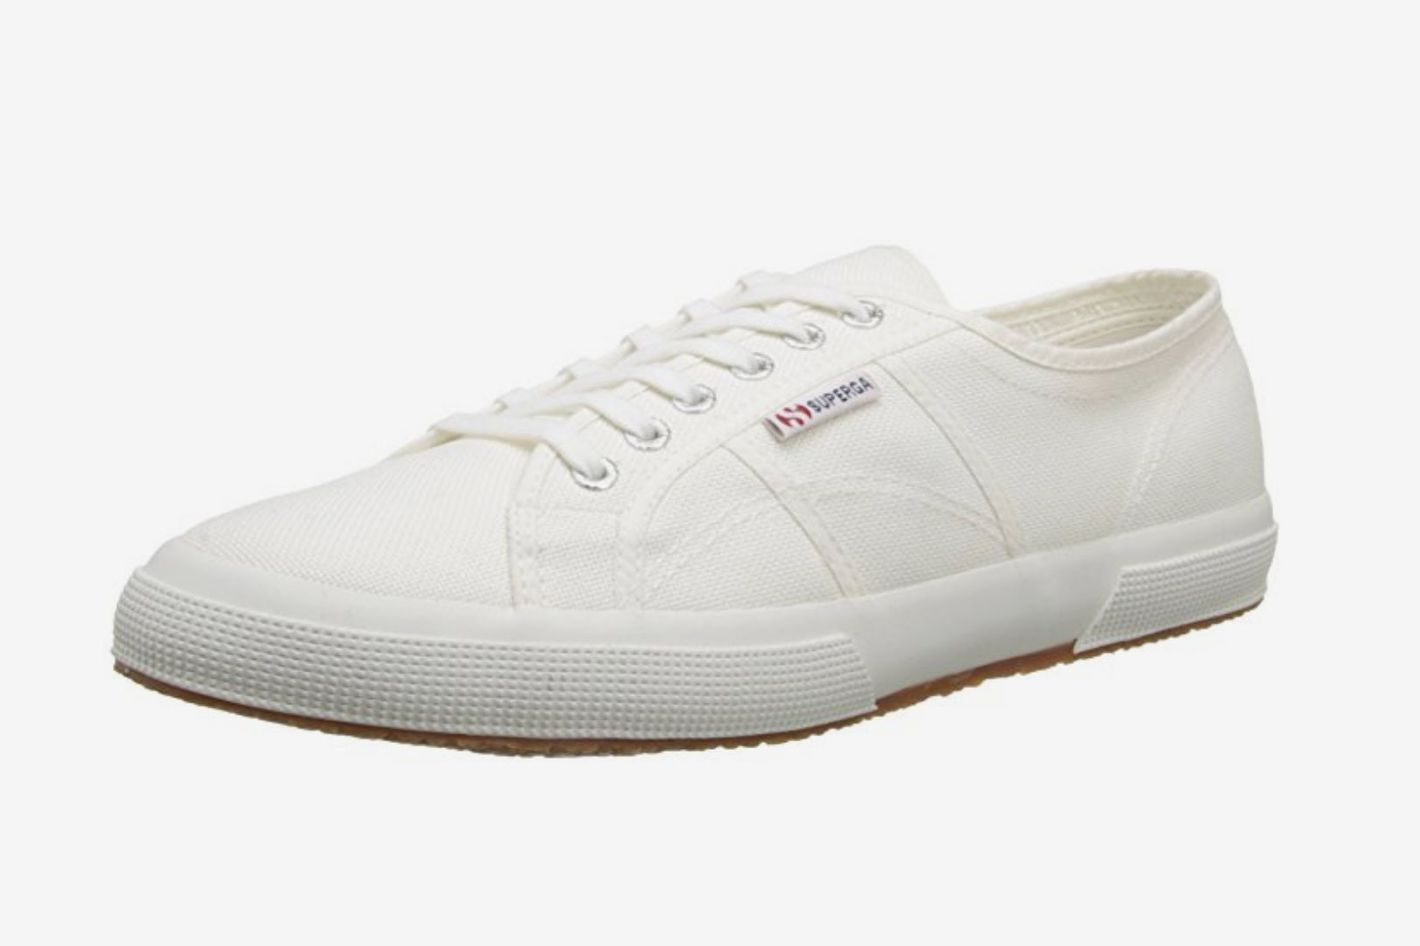 Superga Women's 2750 Cotu Sneaker